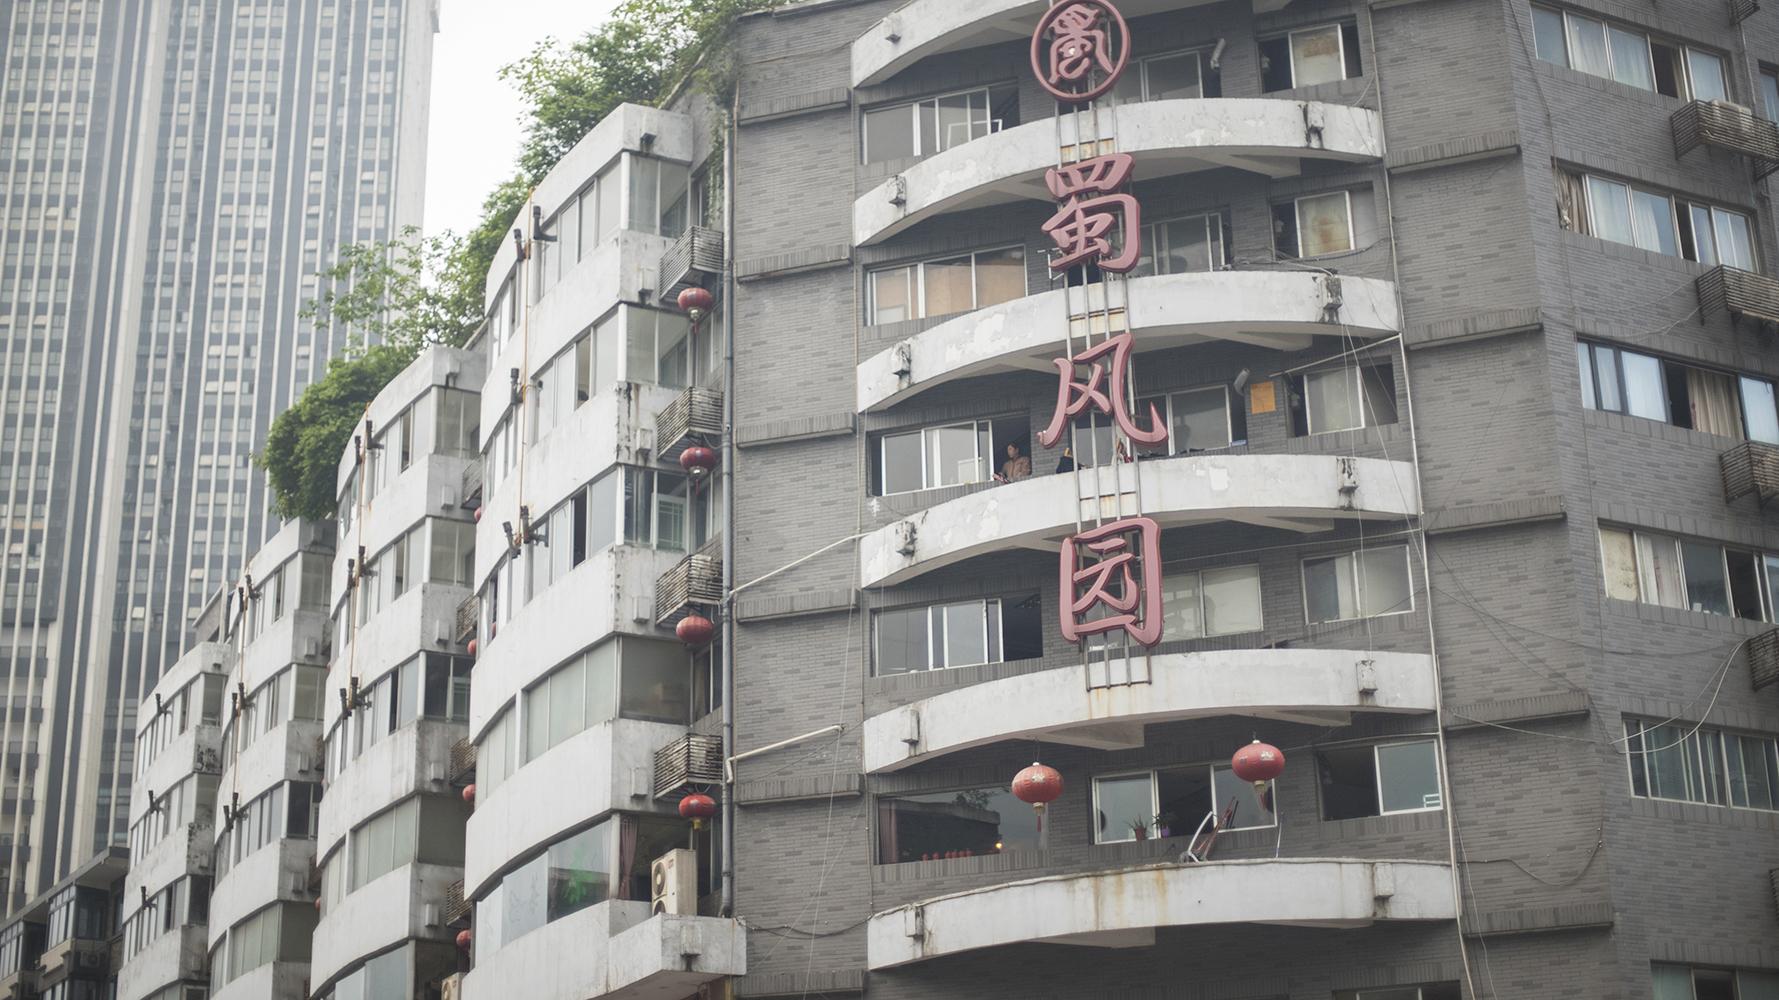 Neighbor in Chengdu Sichuan